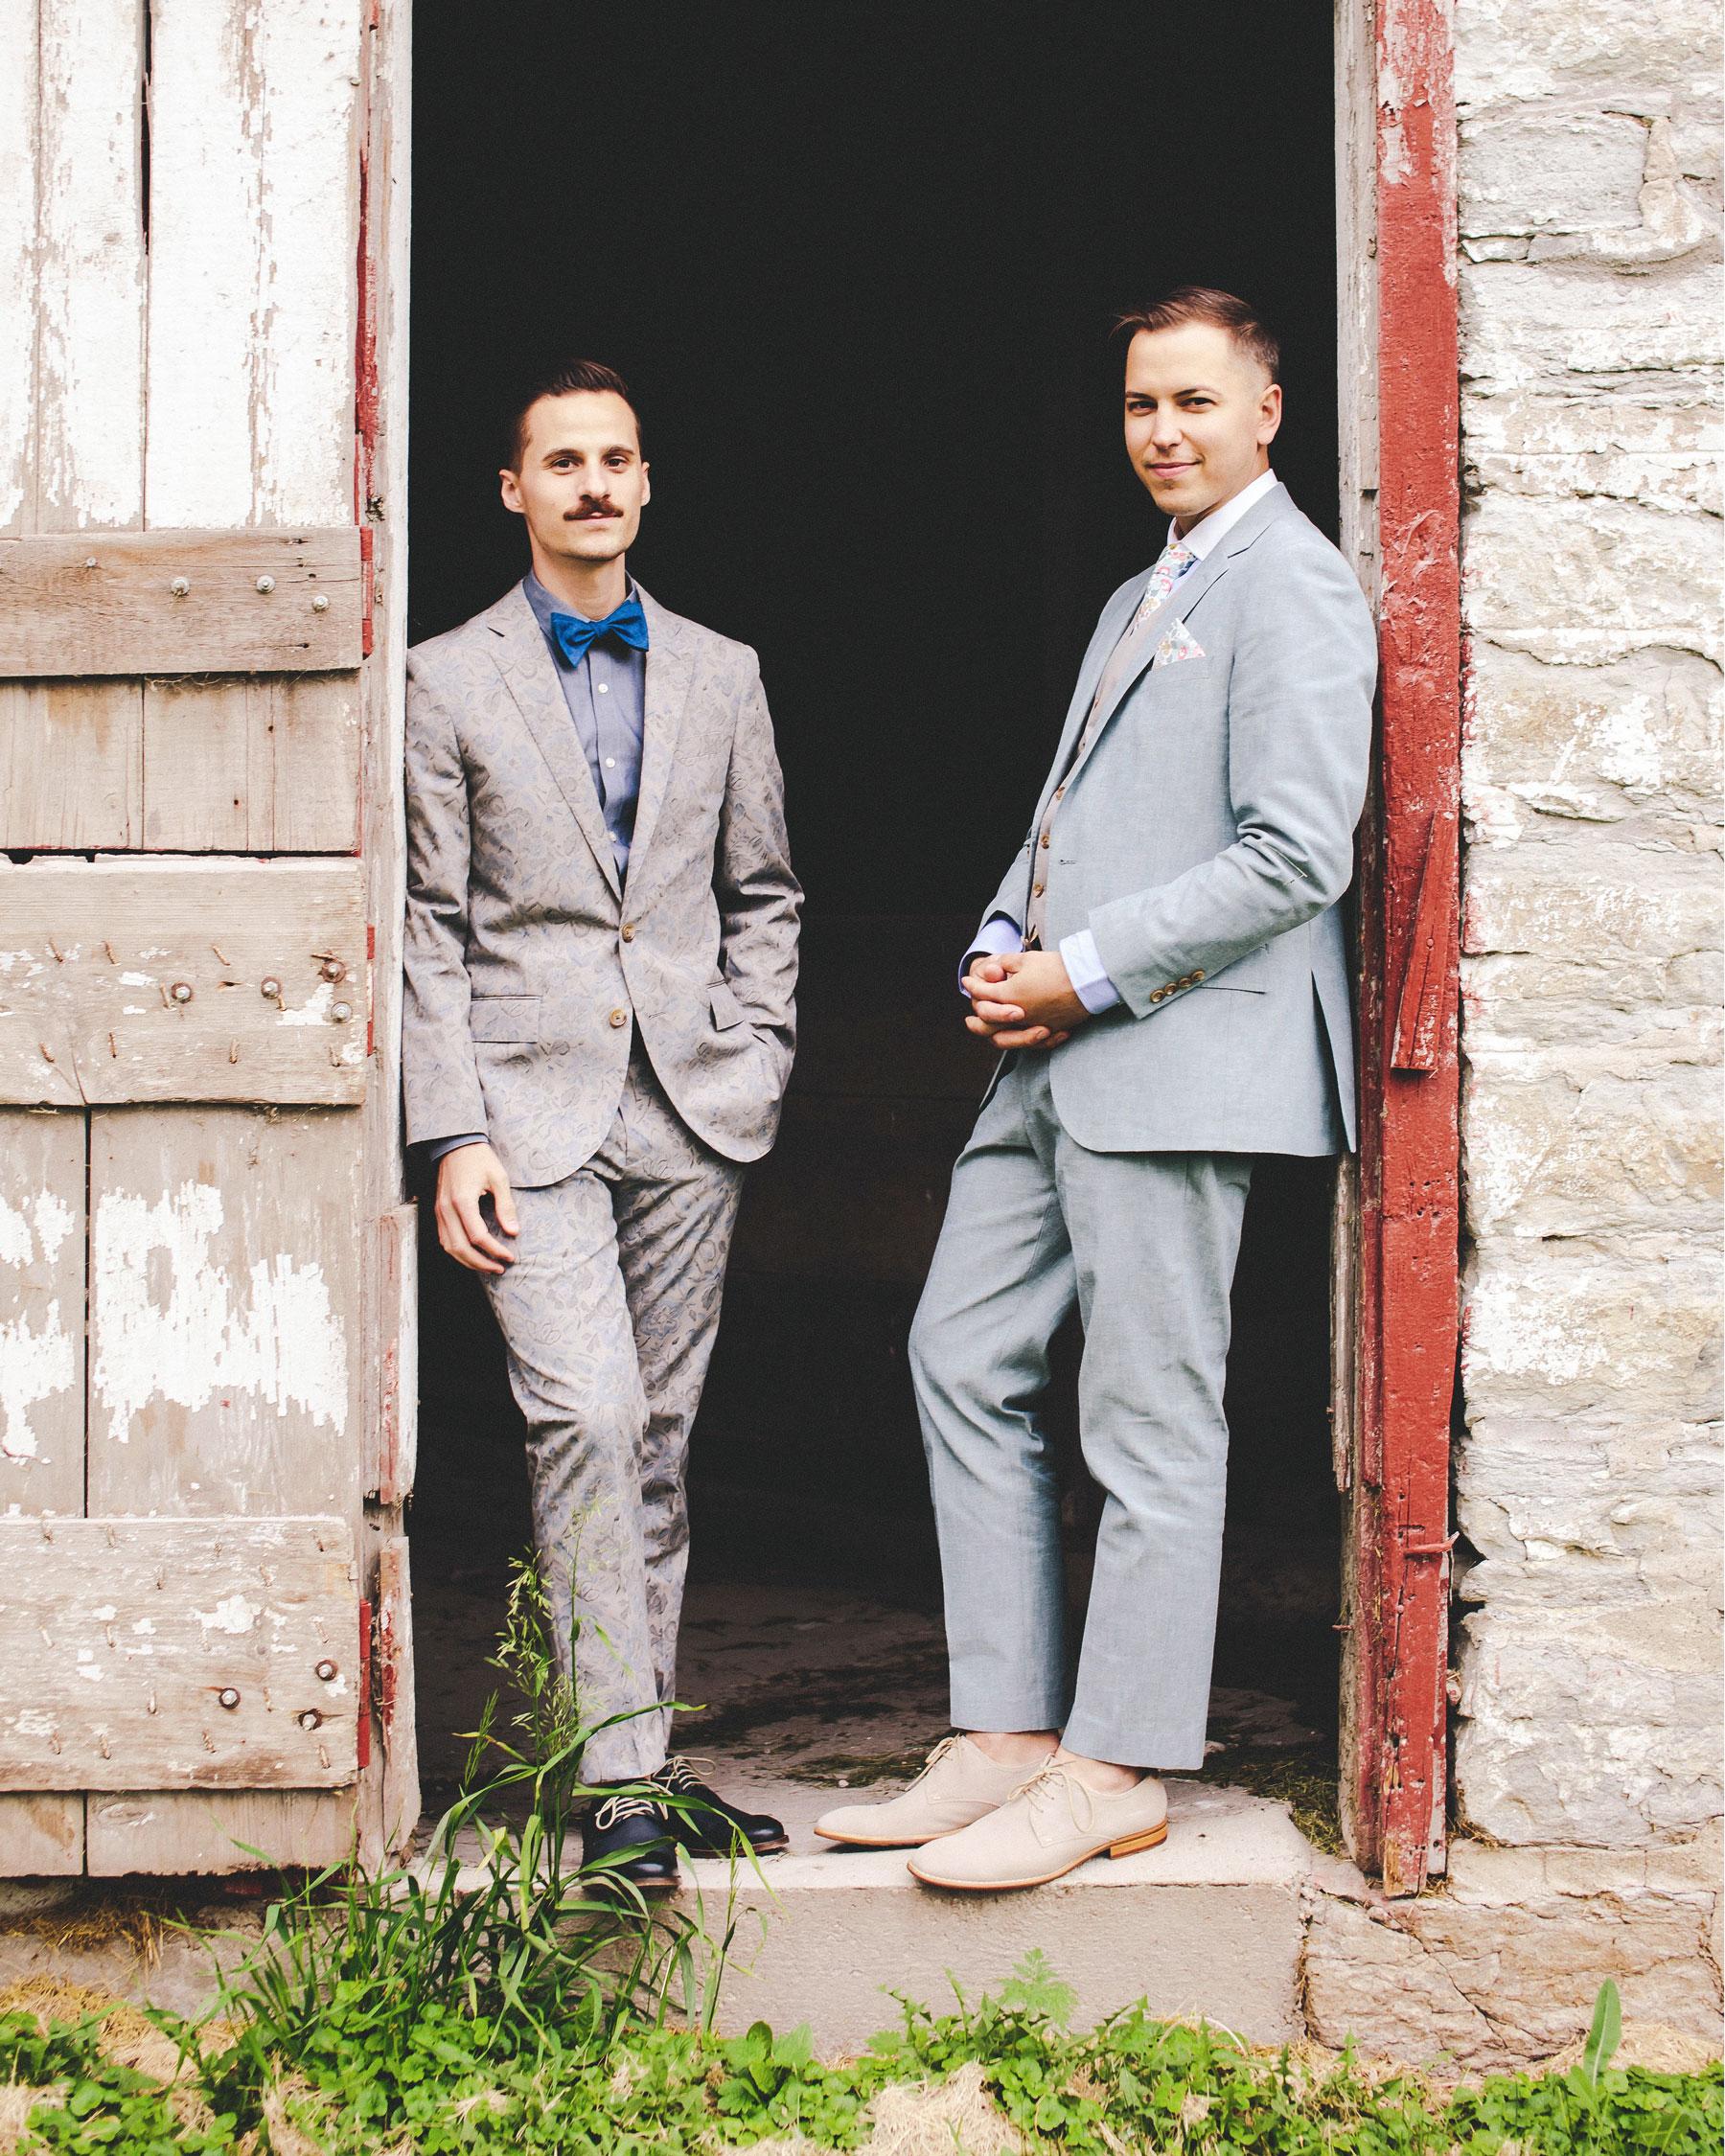 chase-drew-wedding-iowa-grooms-143-s112425.jpg